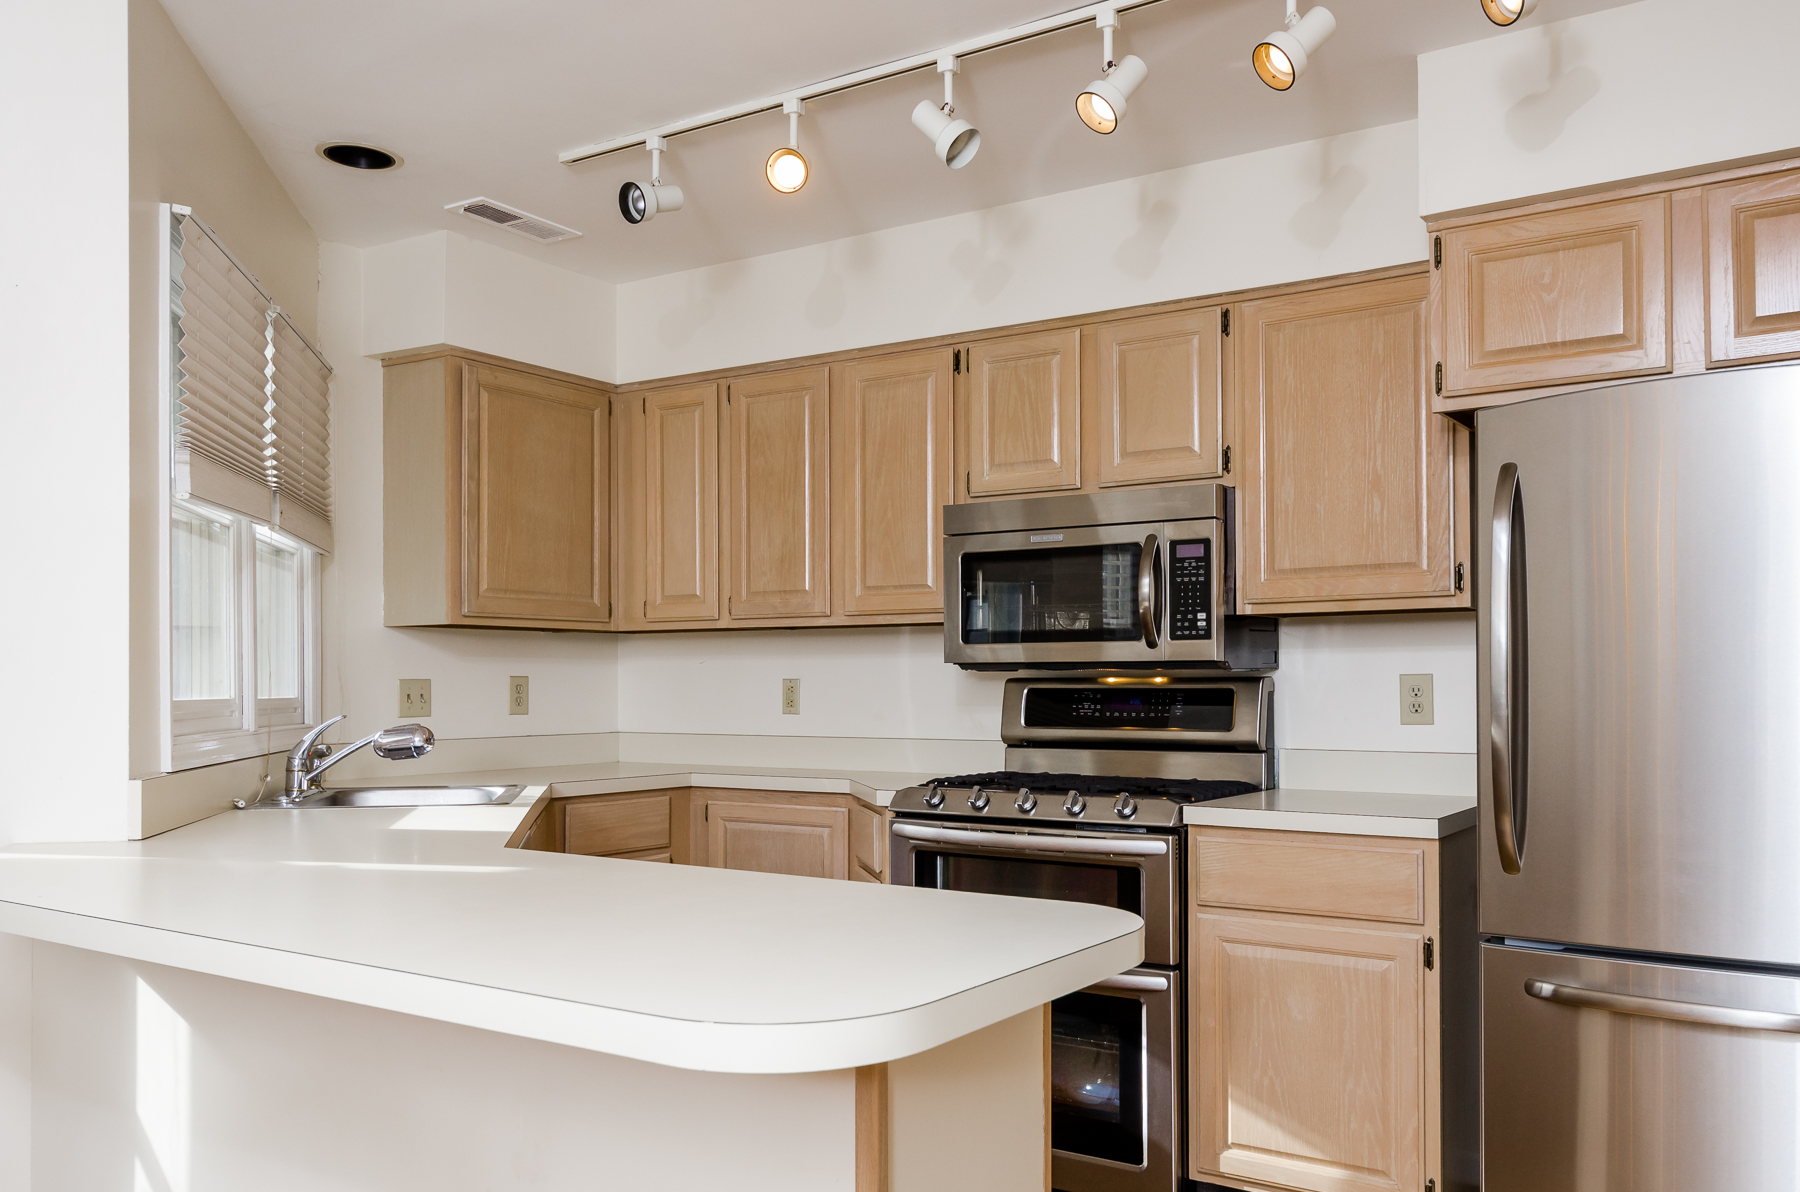 Additional photo for property listing at Simply Sensational 3 Raritan Pointe Lambertville, Nueva Jersey 08530 Estados Unidos